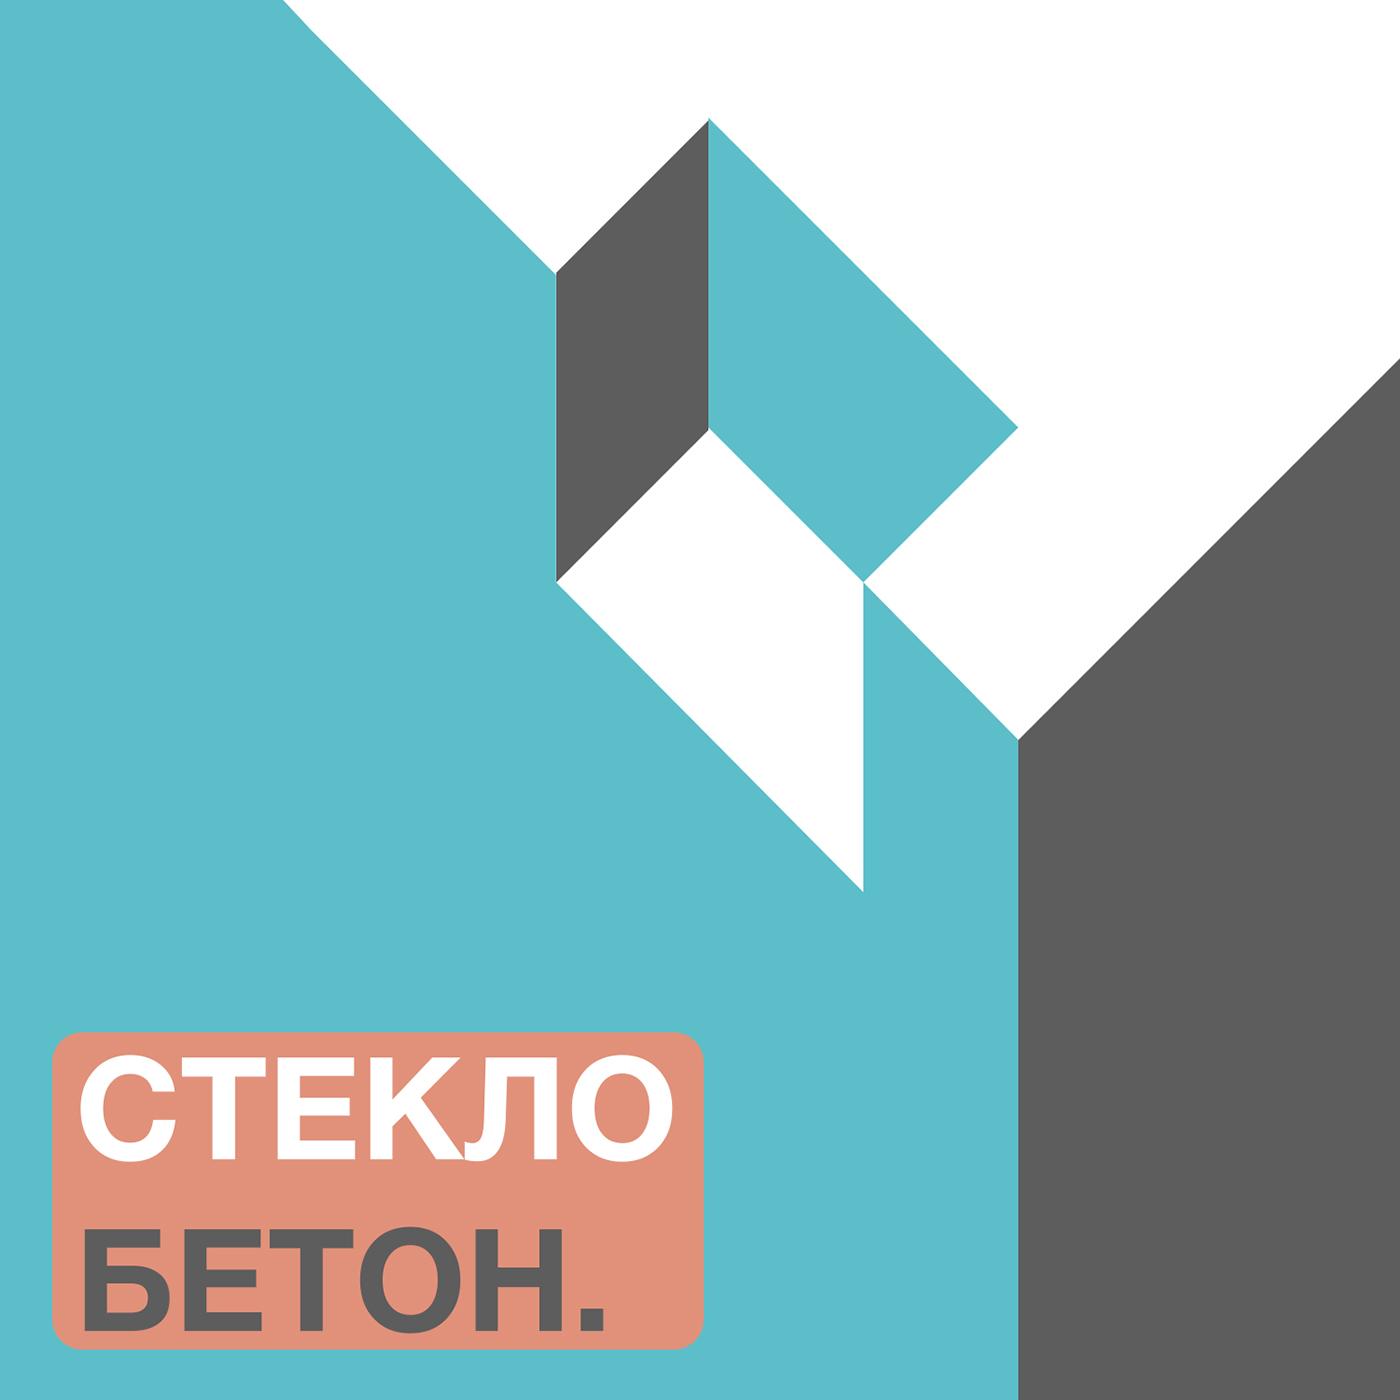 СТЕКЛО БЕТОН. Подкаст об Архитектуре